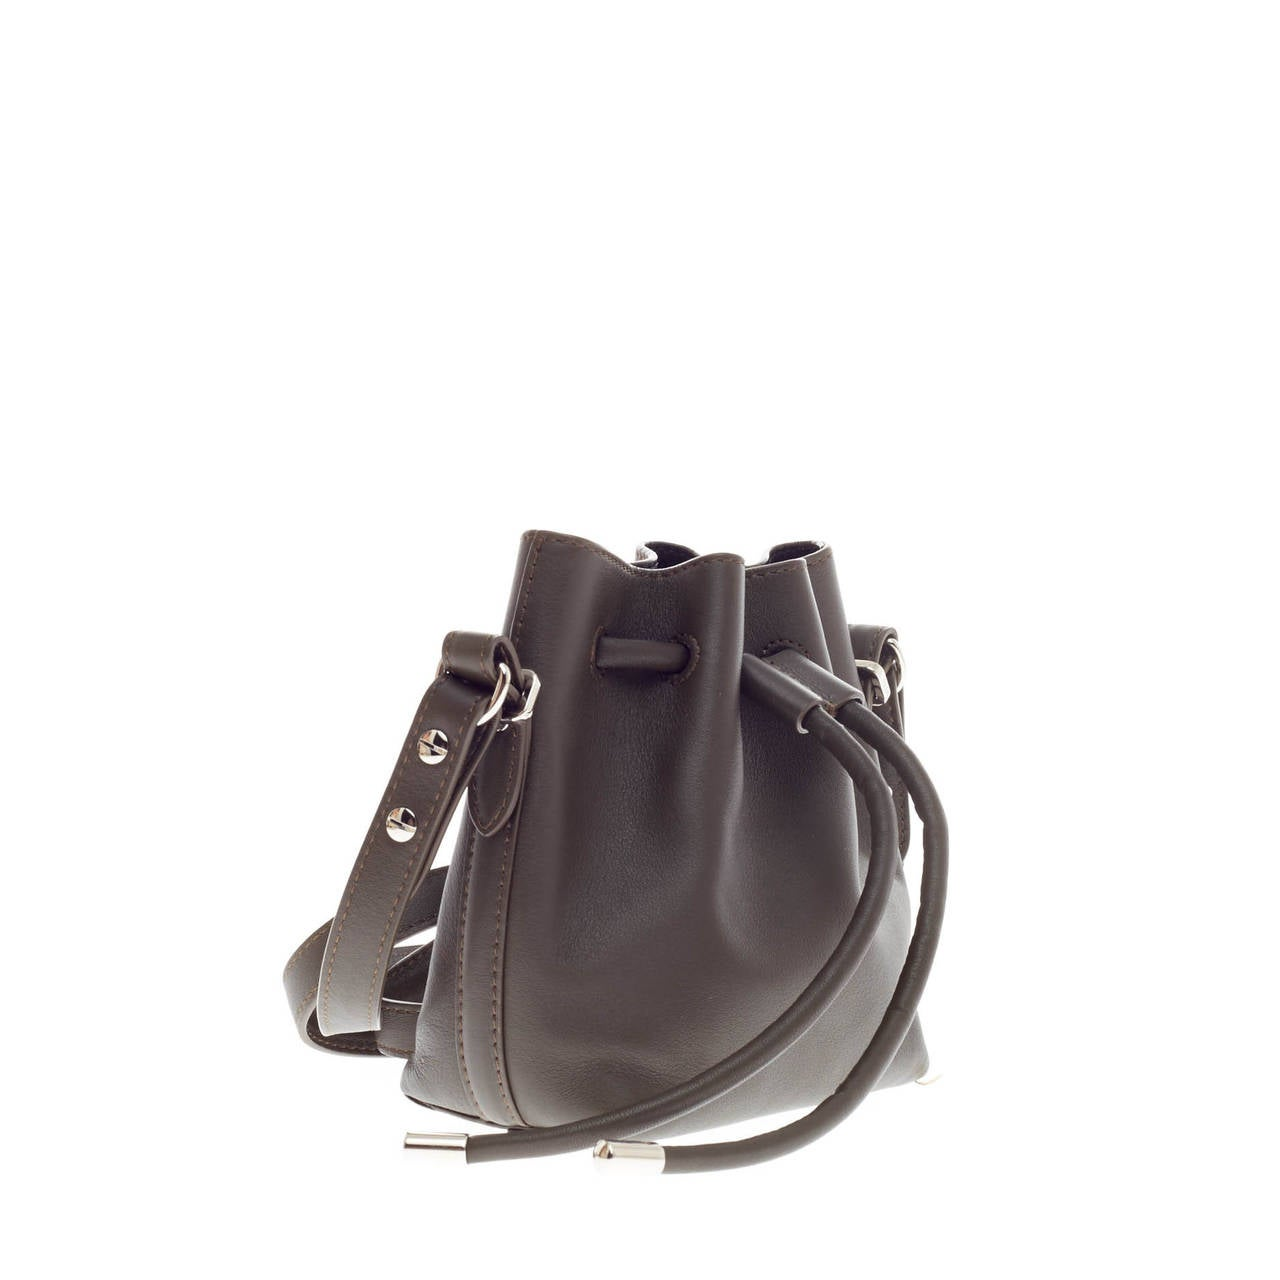 Proenza Schouler Bucket Bag Leather Tiny 3